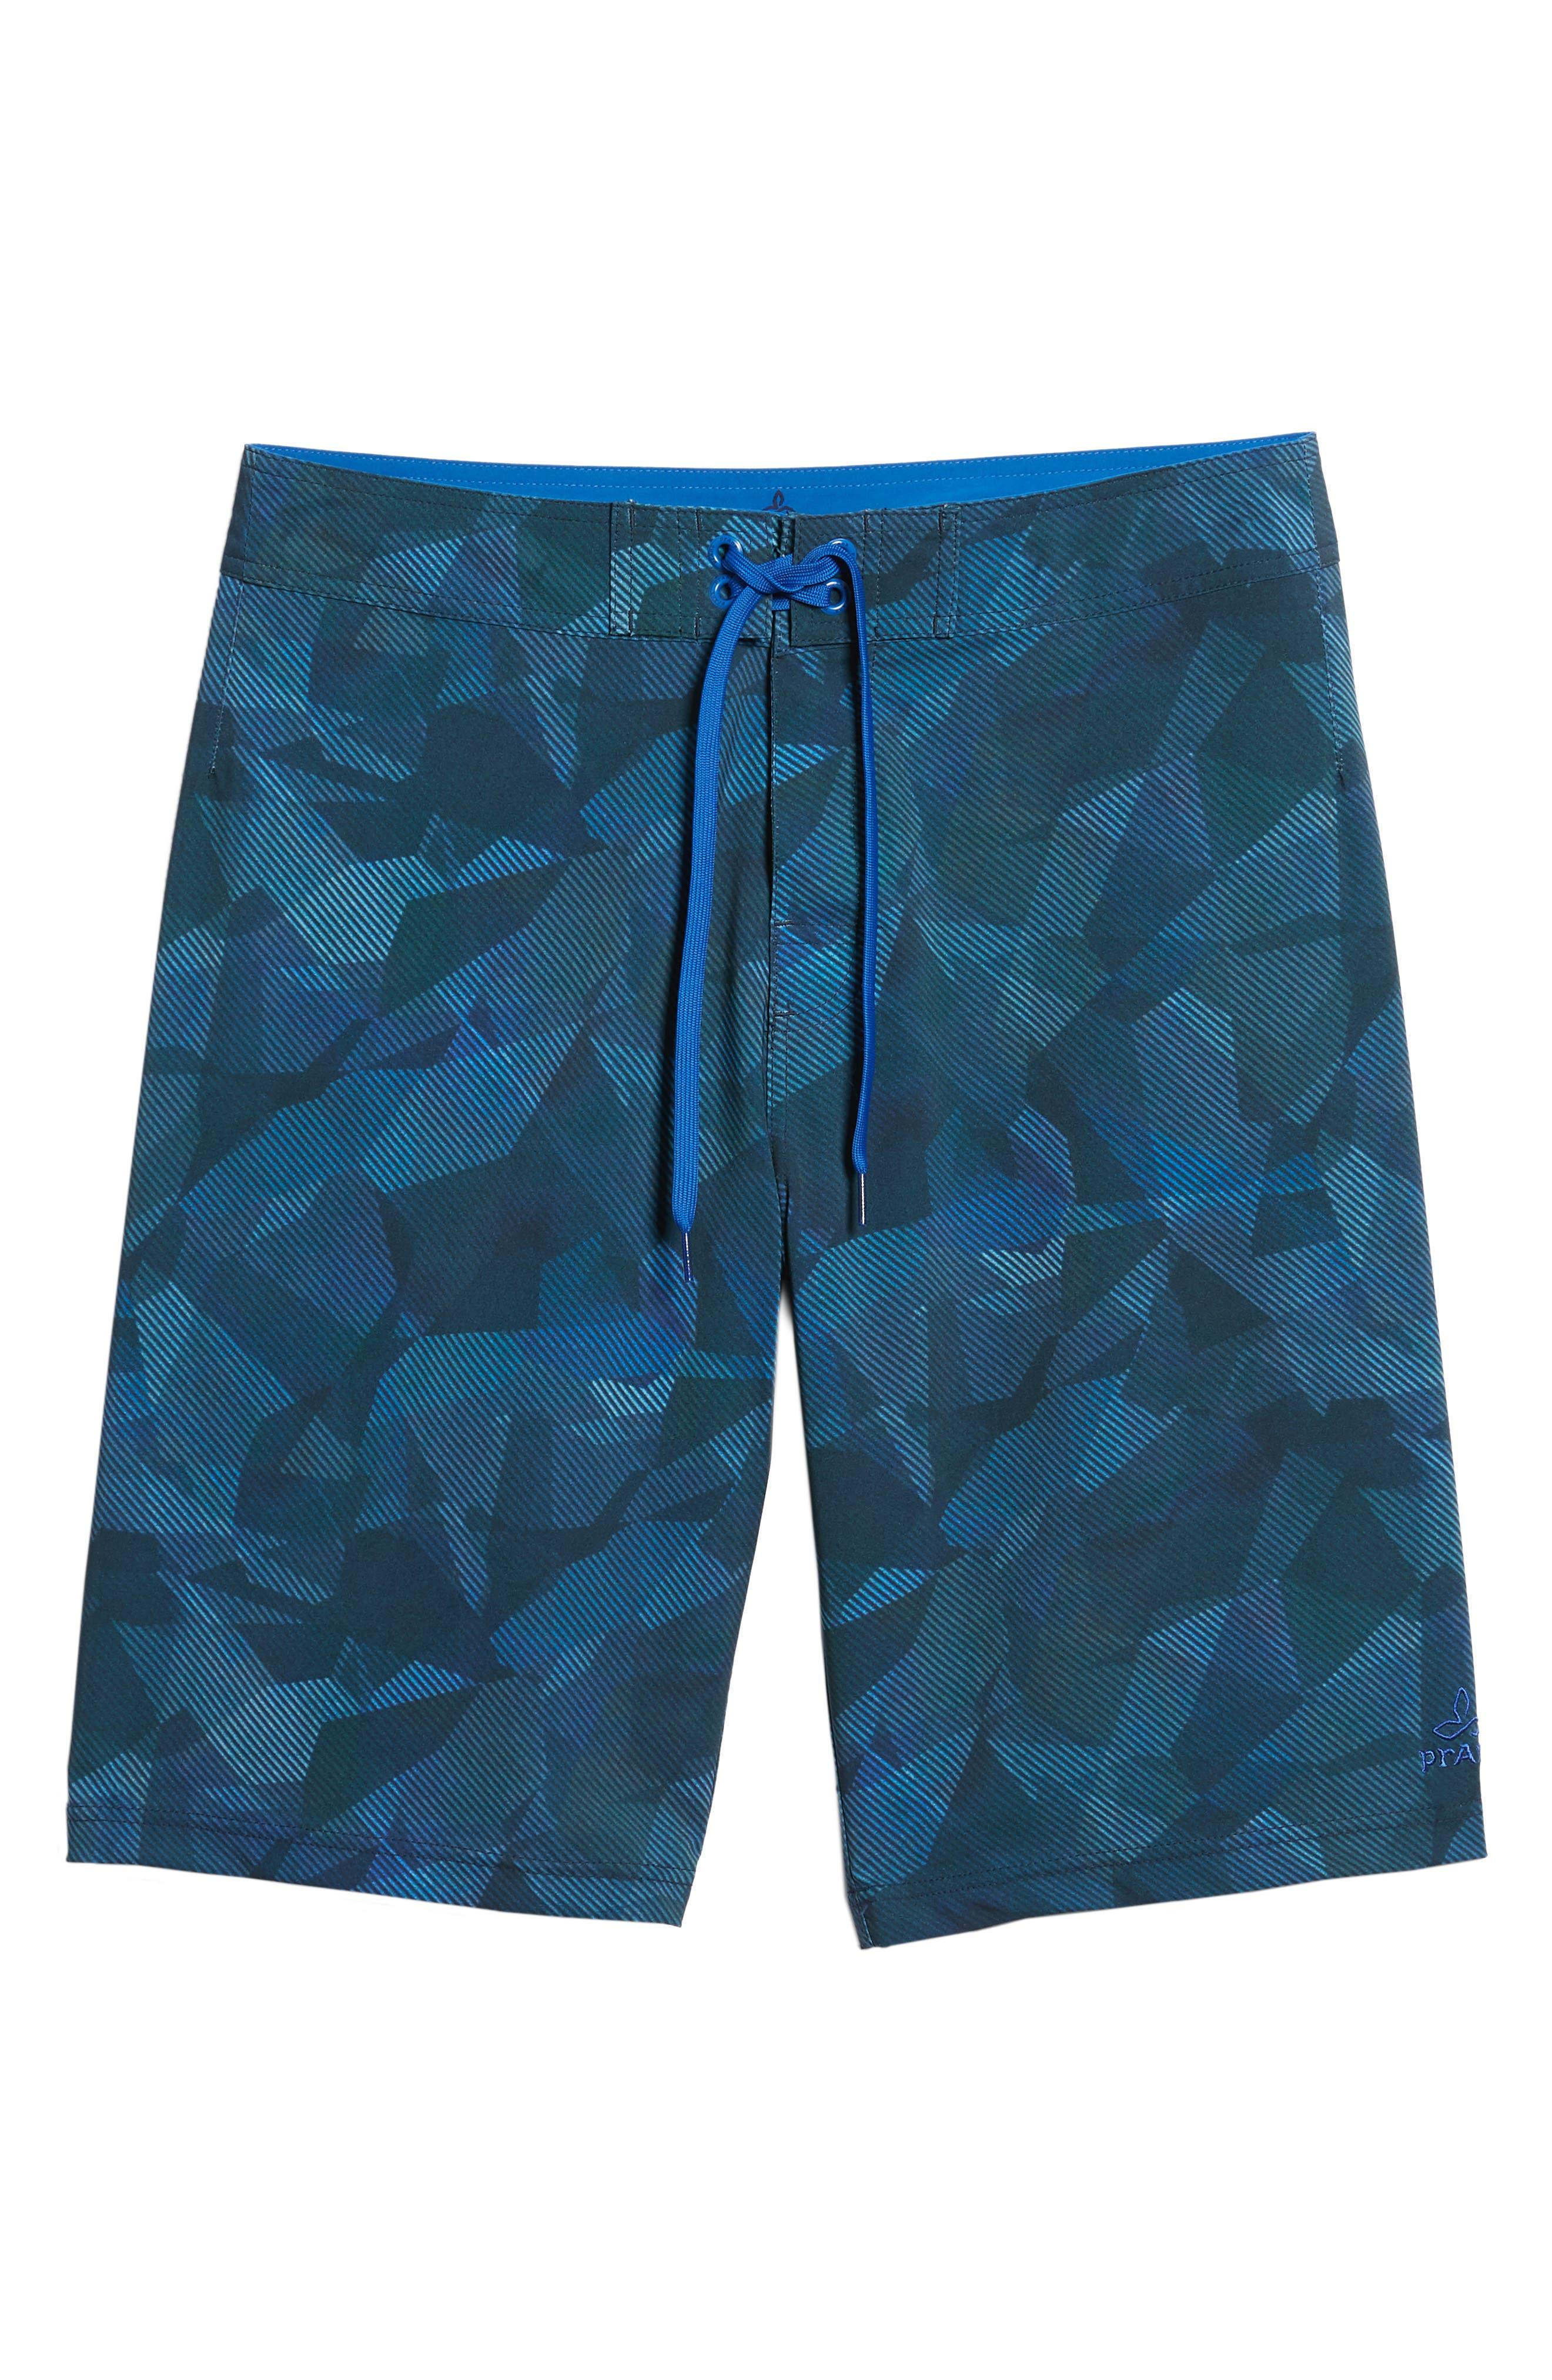 'Sediment' Stretch Board Shorts,                         Main,                         color, Island Blue Hex